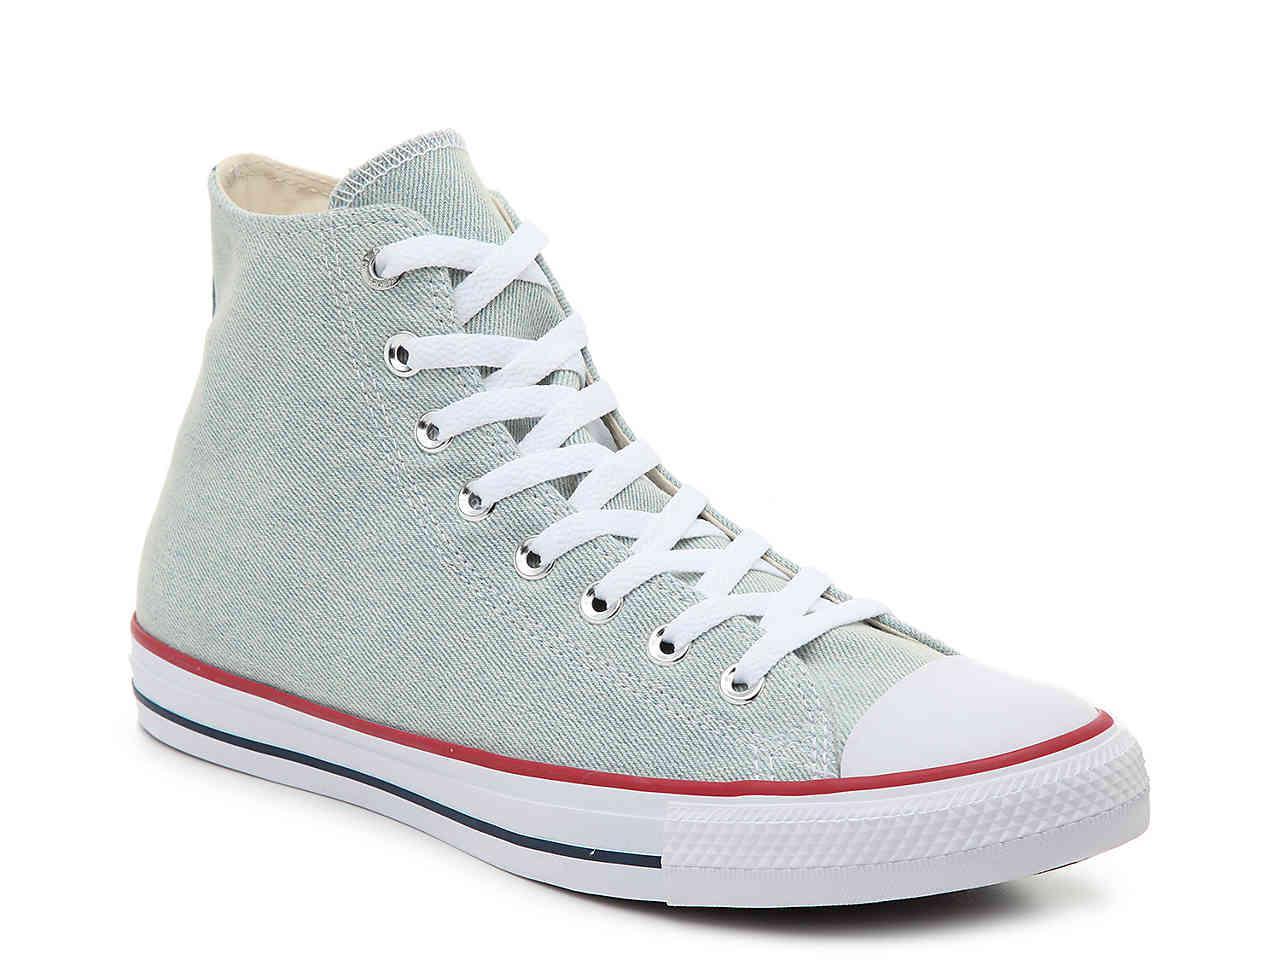 9d3fa19cf939df Lyst - Converse Chuck Taylor All Star High-top Sneaker in Blue